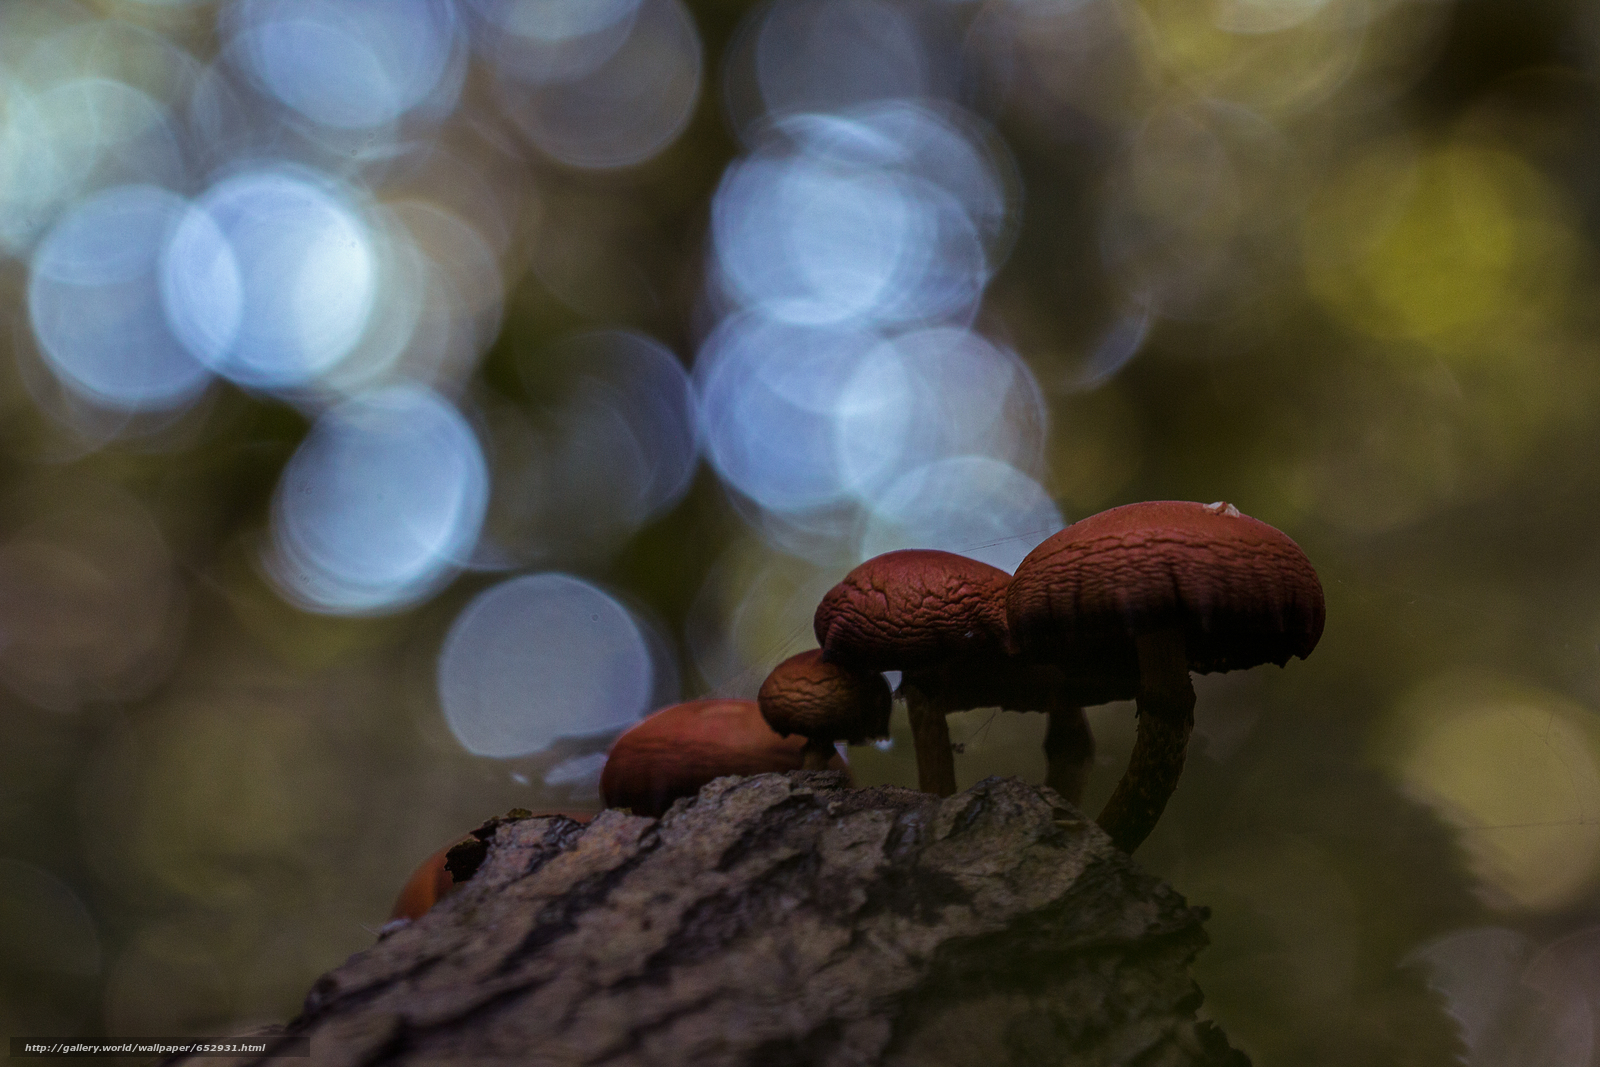 Download wallpaper mushrooms,  mushroom,  Macro free desktop wallpaper in the resolution 5184x3456 — picture №652931